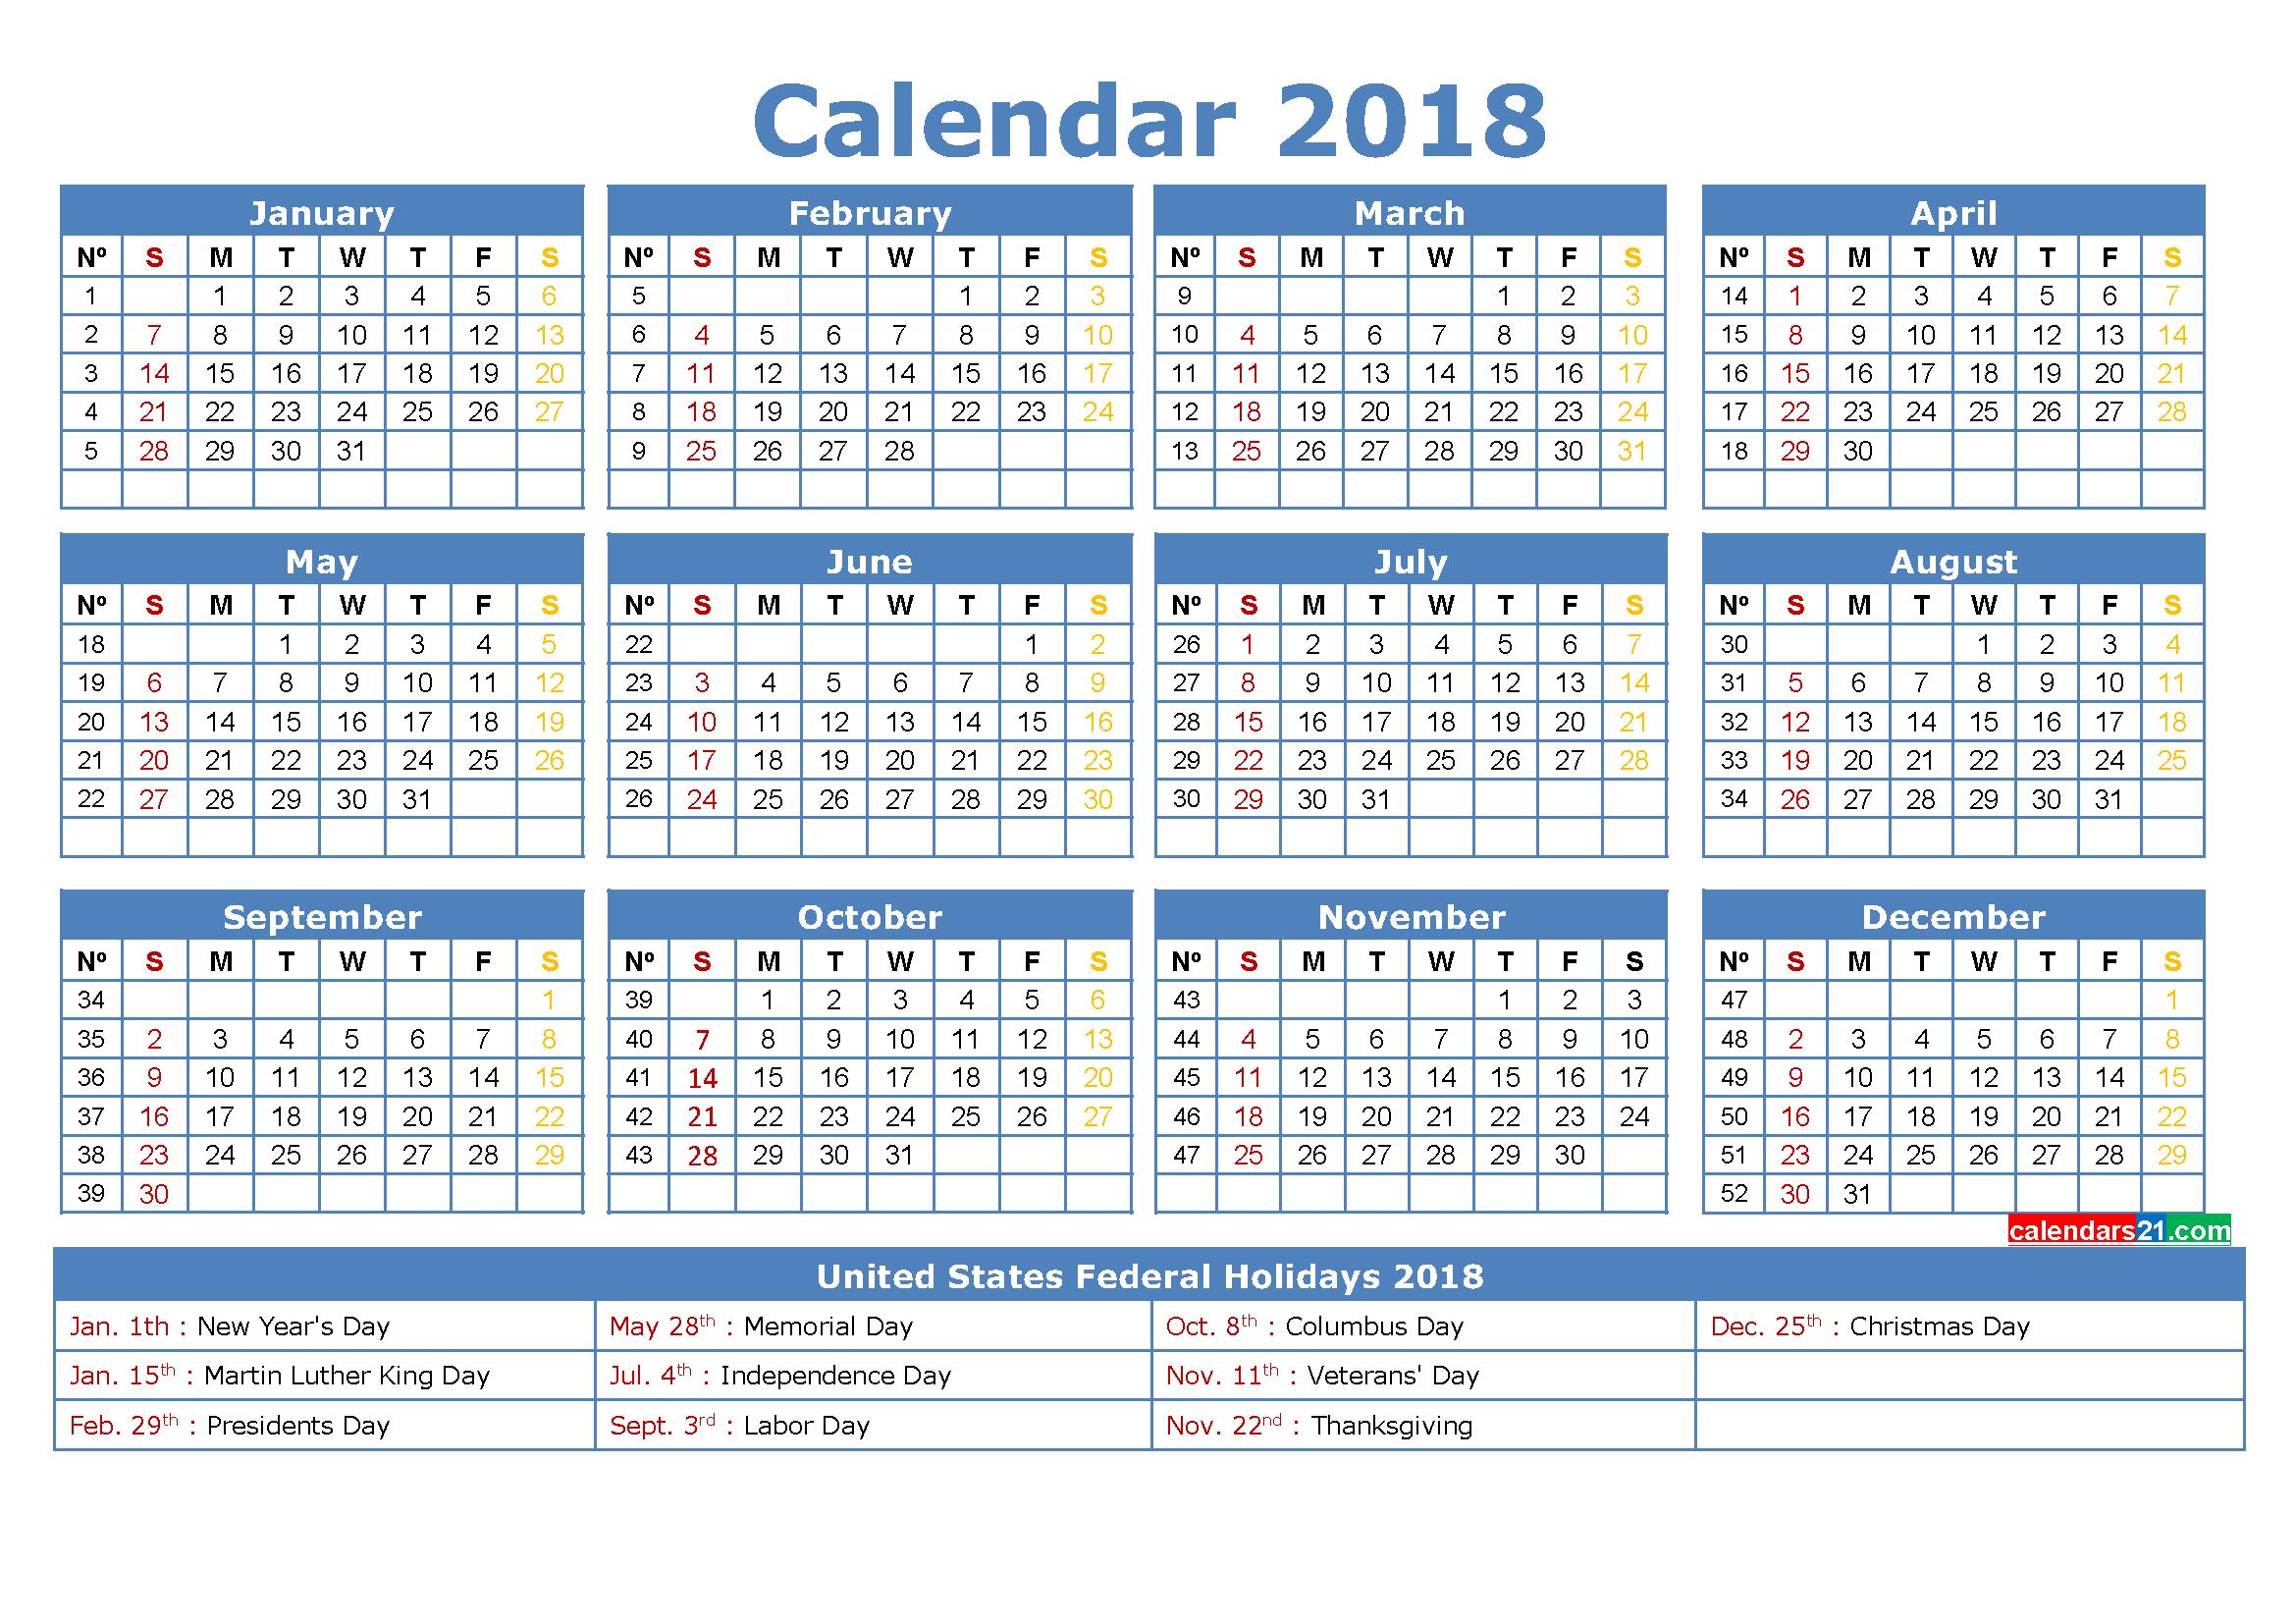 Printable Calendar 2018 With Holidays Full Year (4